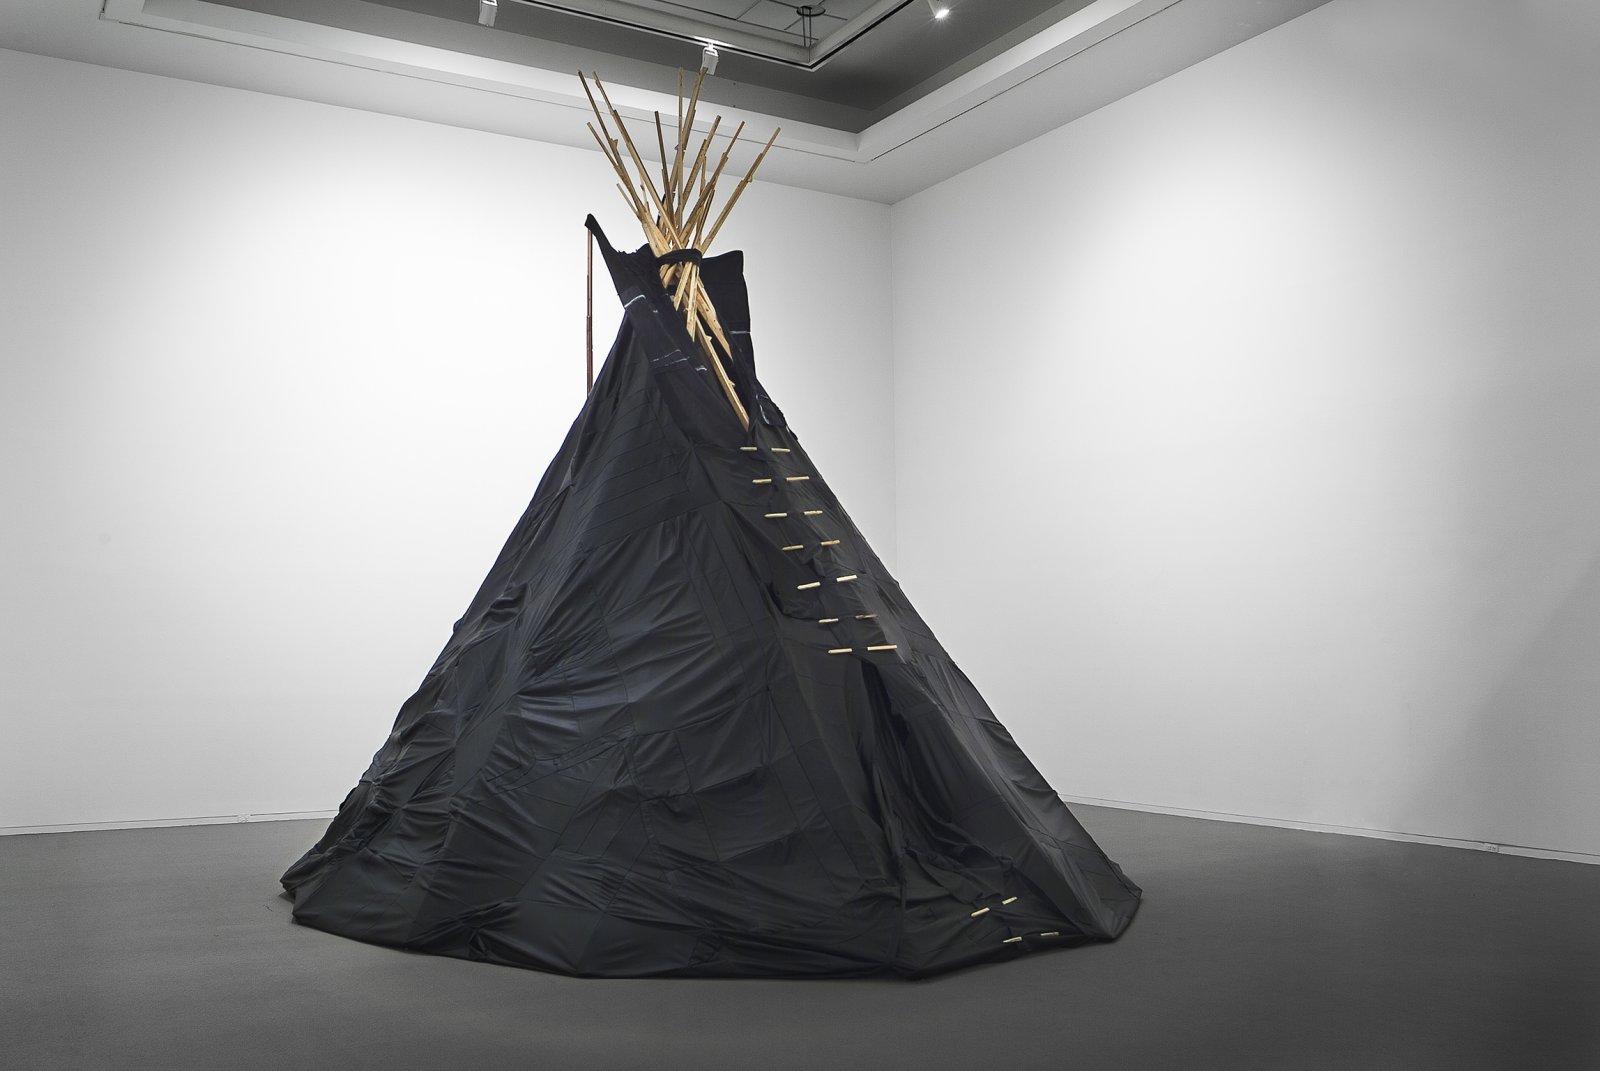 Brian Jungen,Furniture Sculpture, 2006,11 black leather couches, wood, 244 x 232 x 284 in. (620 x 589 x 721 cm)